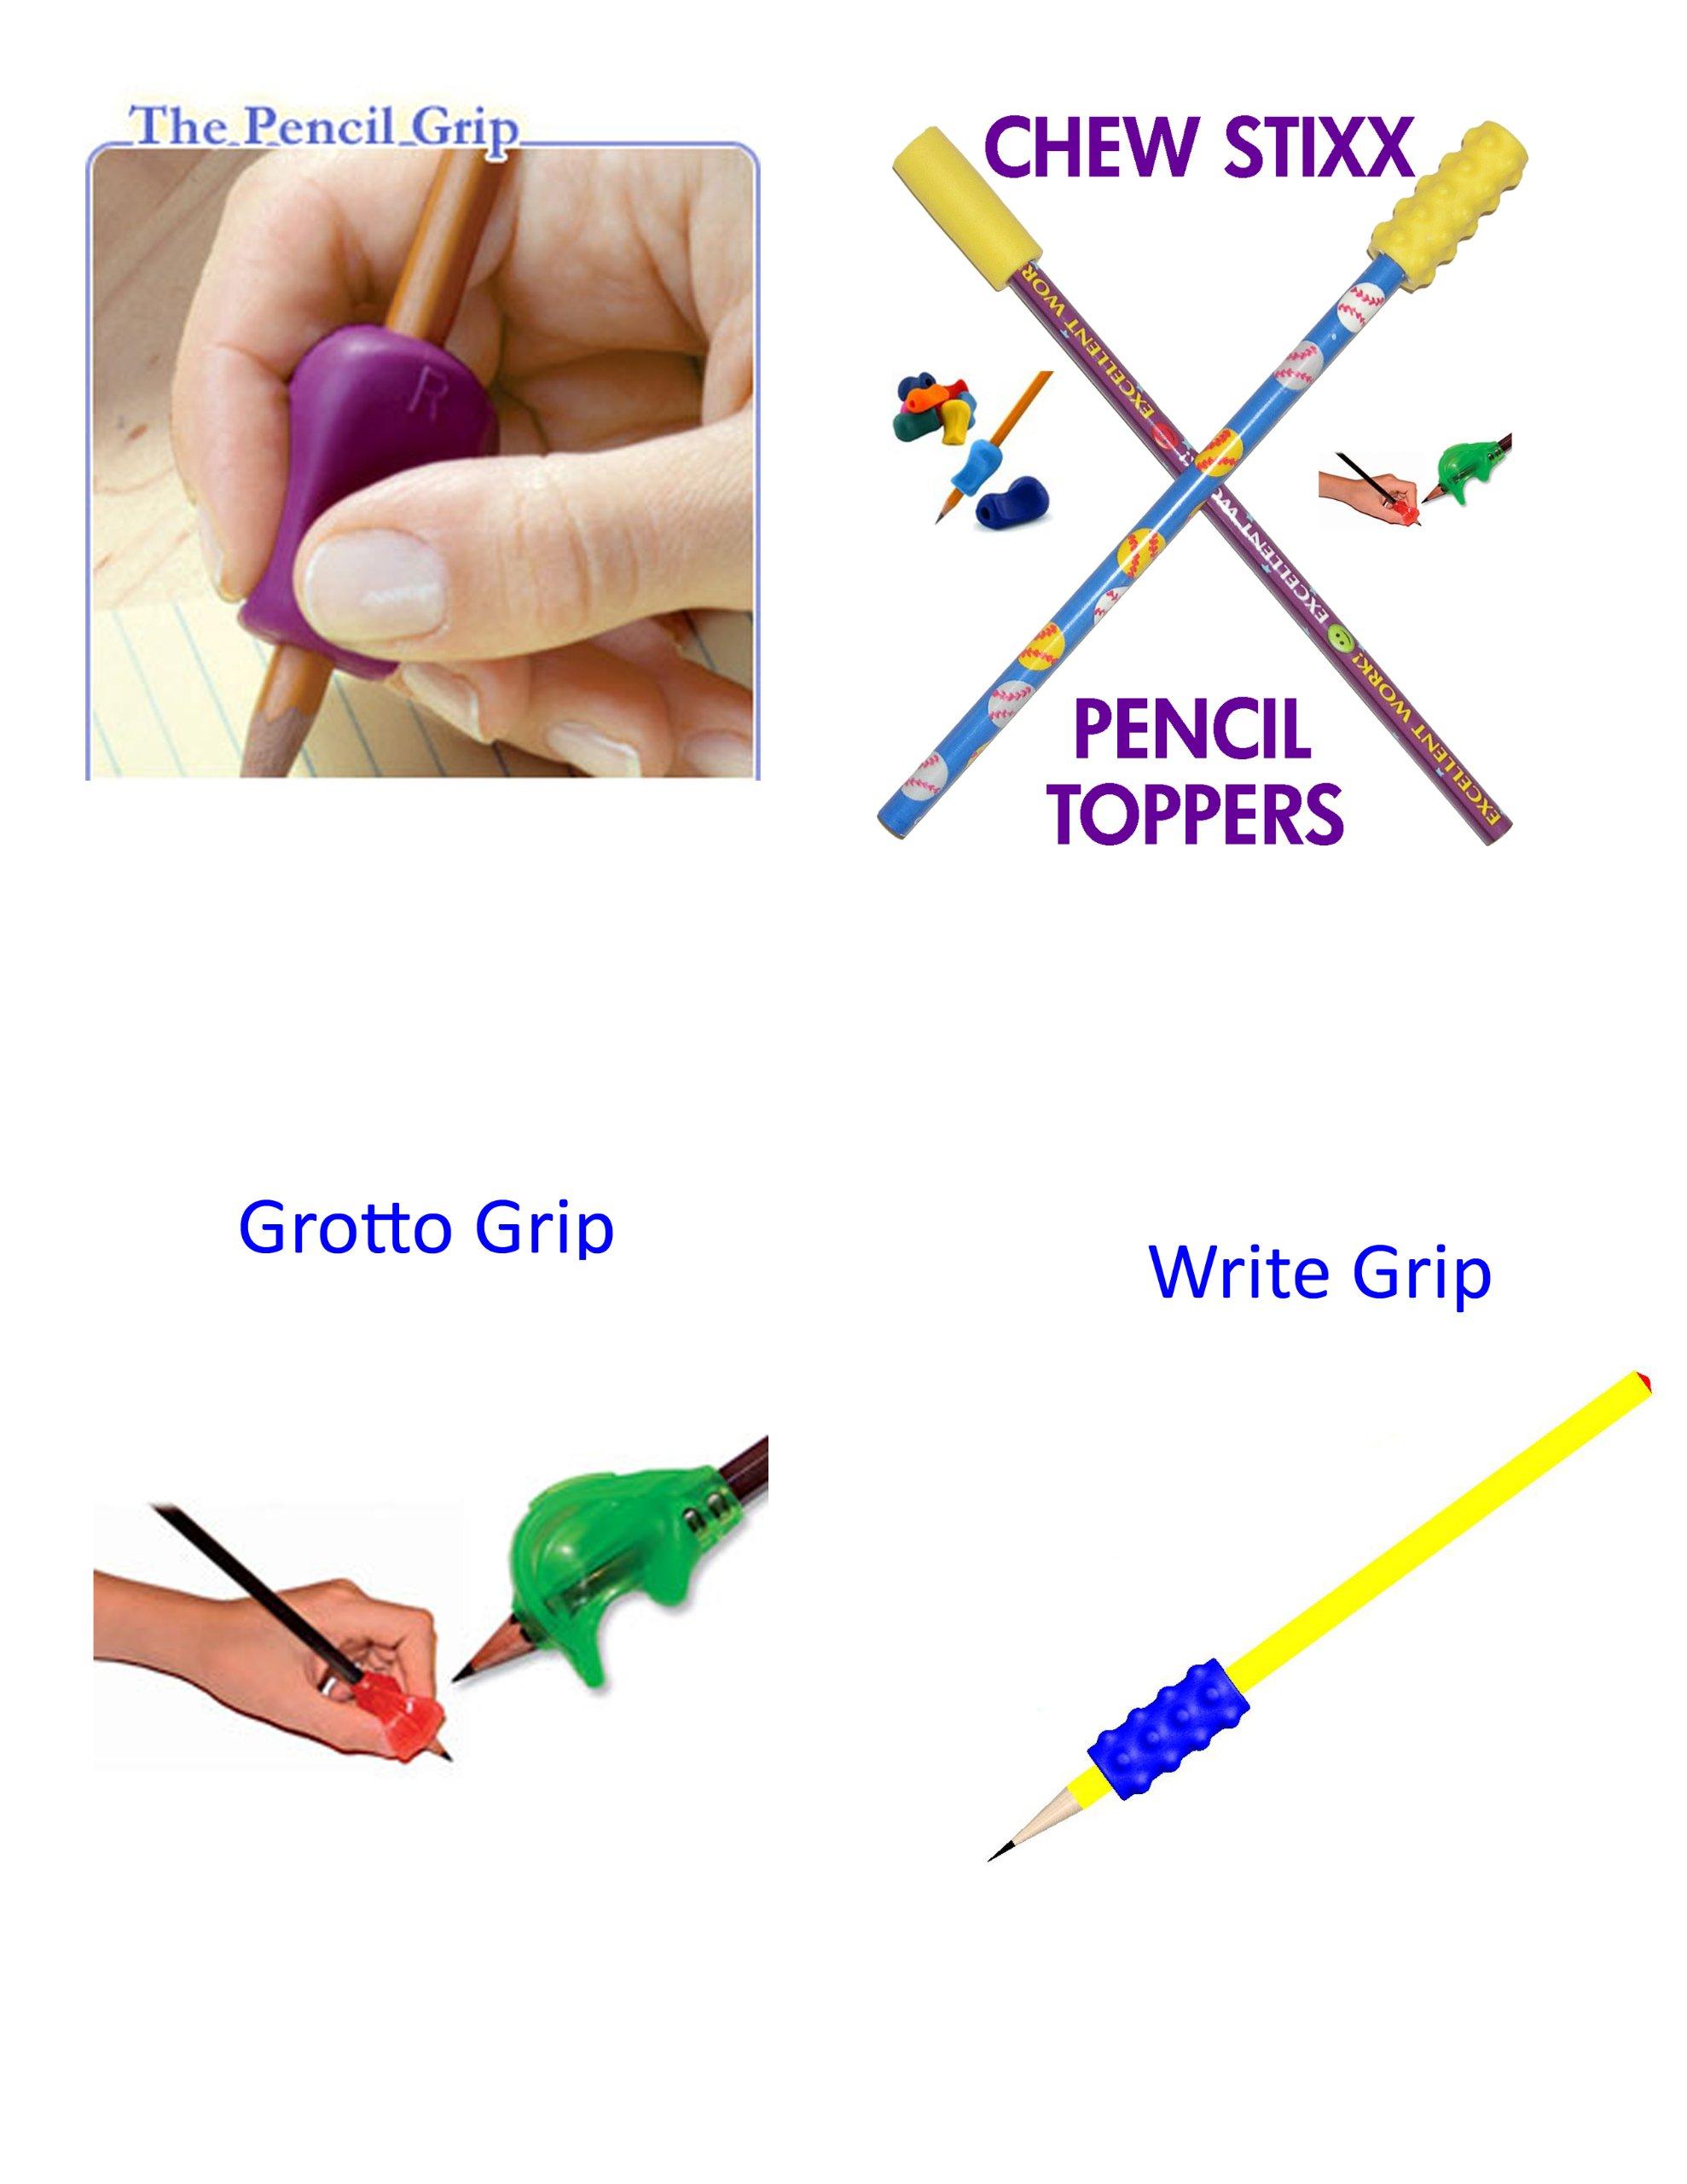 Pencil Grip, Grotto Grip, Write Grip, Chew Stixx Pencil Topper Ultimate Combo